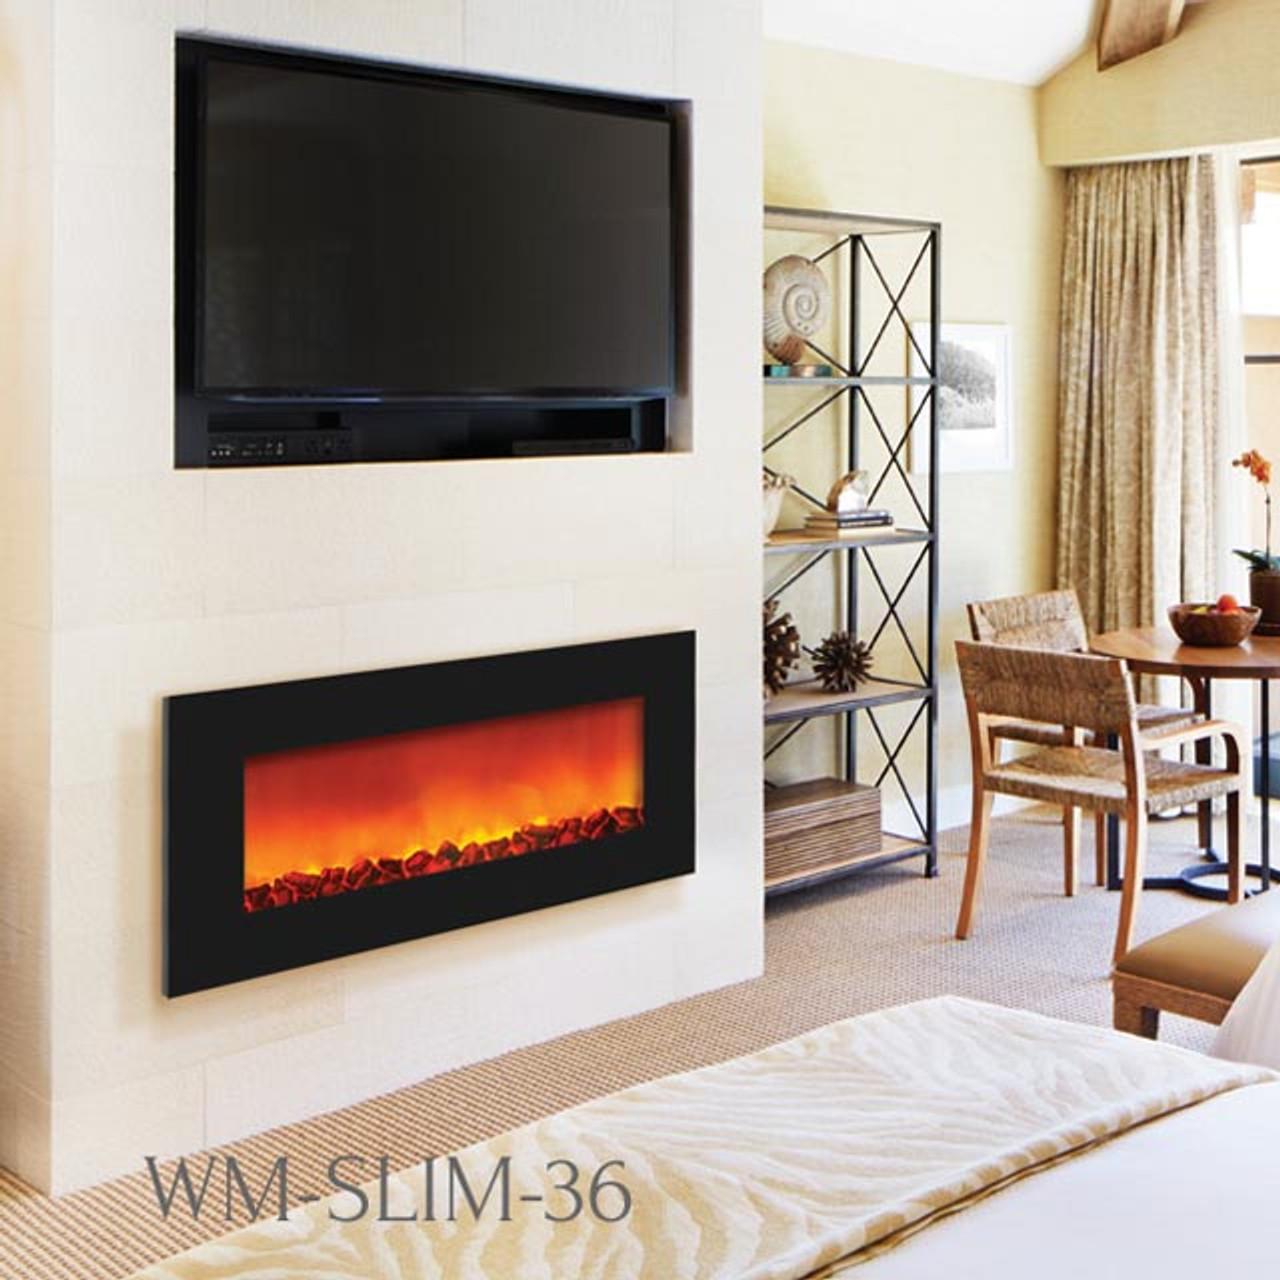 Sierra Flame Wm Slim 36 Slim Wall Mount Electric Fireplace